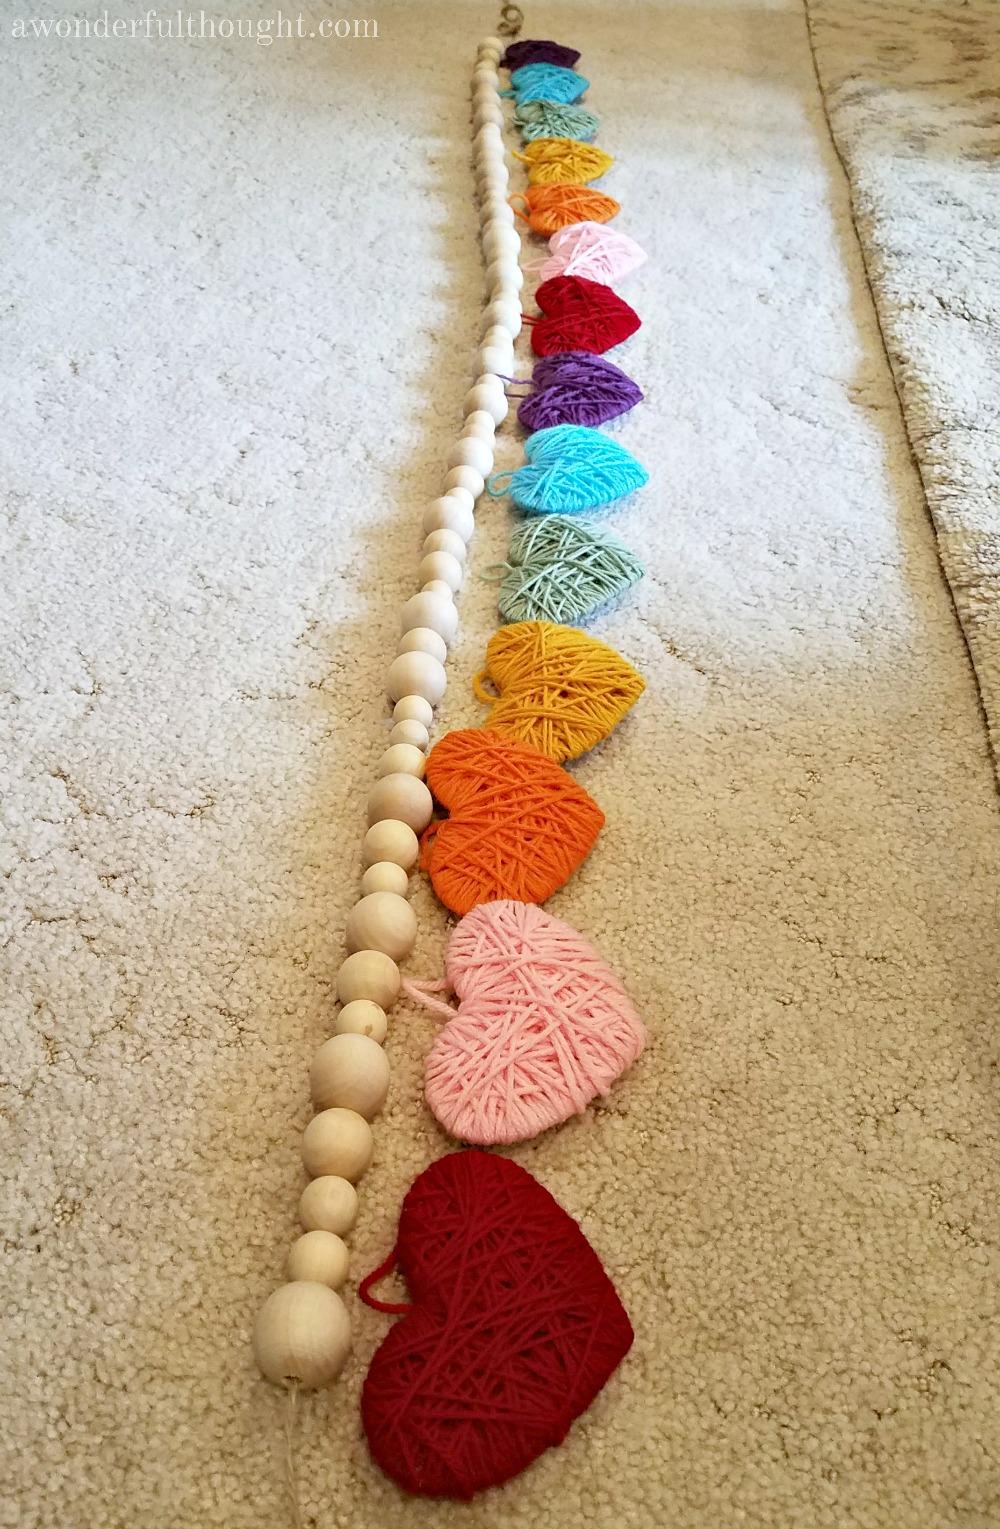 Mulitcolored Yarn Heart Garland #heartgarland #valentinesdaydecor #valentinesday #awonderfulthought